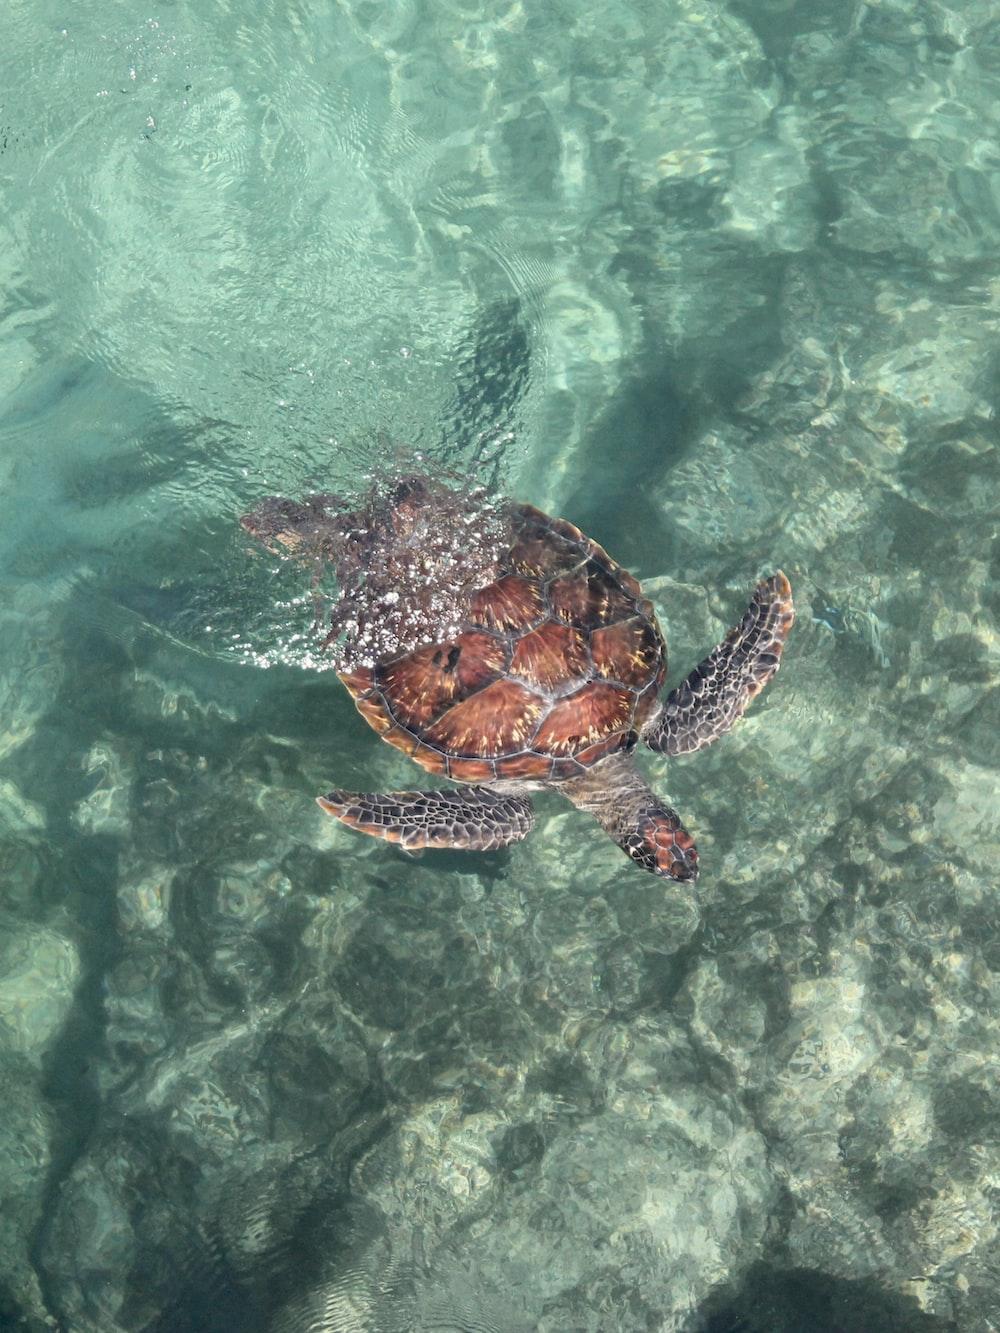 brown turtle in water